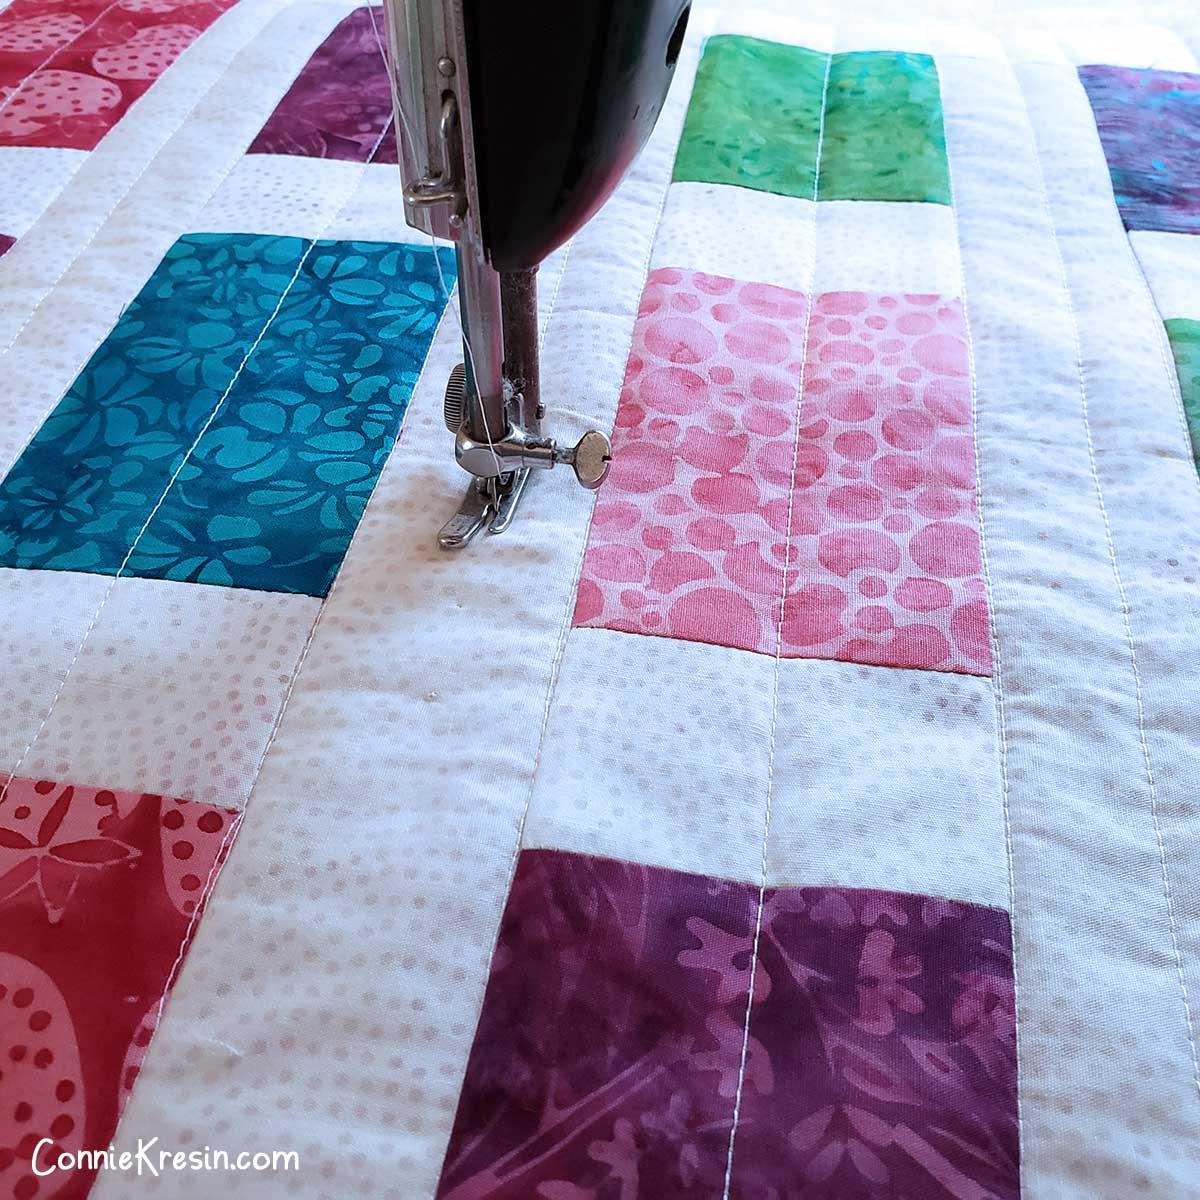 straight stitch quilting on my vintage Singer sewing machine